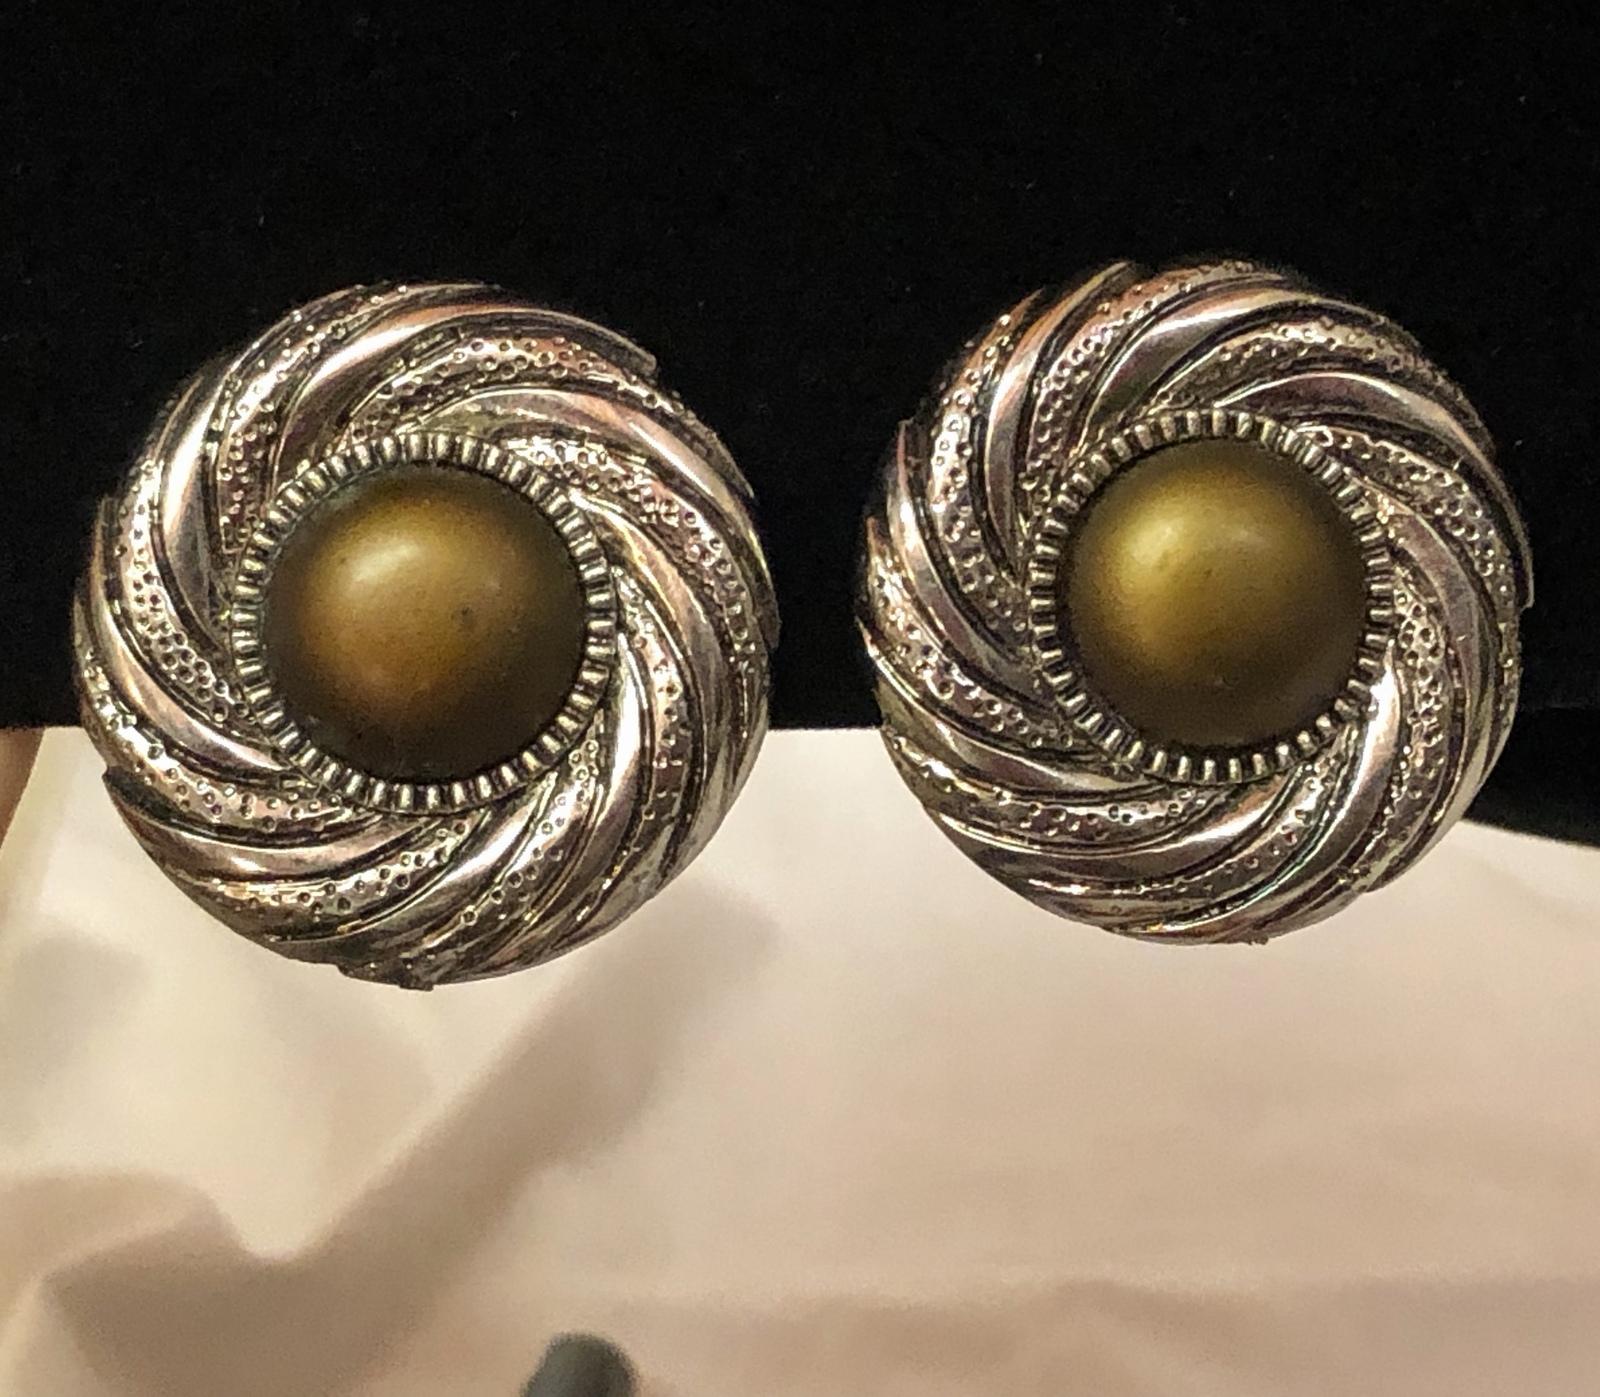 VTG 80s Swirl Medallion Olive-Bronze Centers/Silvertone Round Clip On Earrings image 3